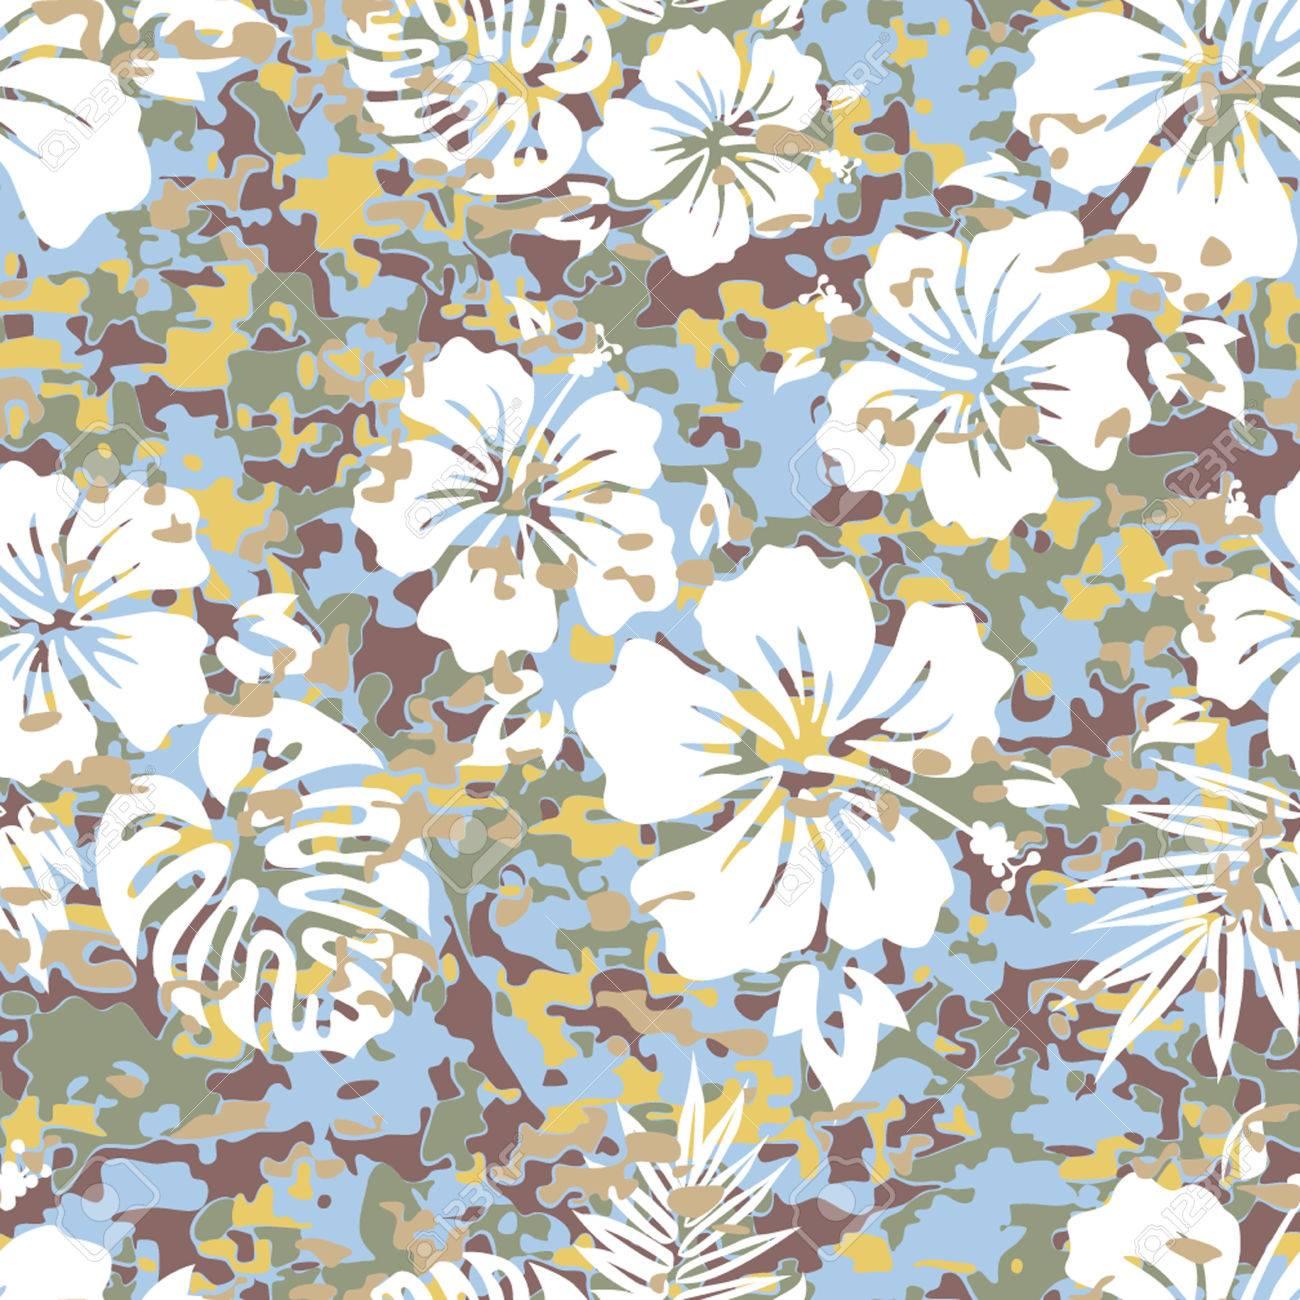 Aloha Hawaiian Shirt Camouflage Seamless Background Pattern Stock Vector